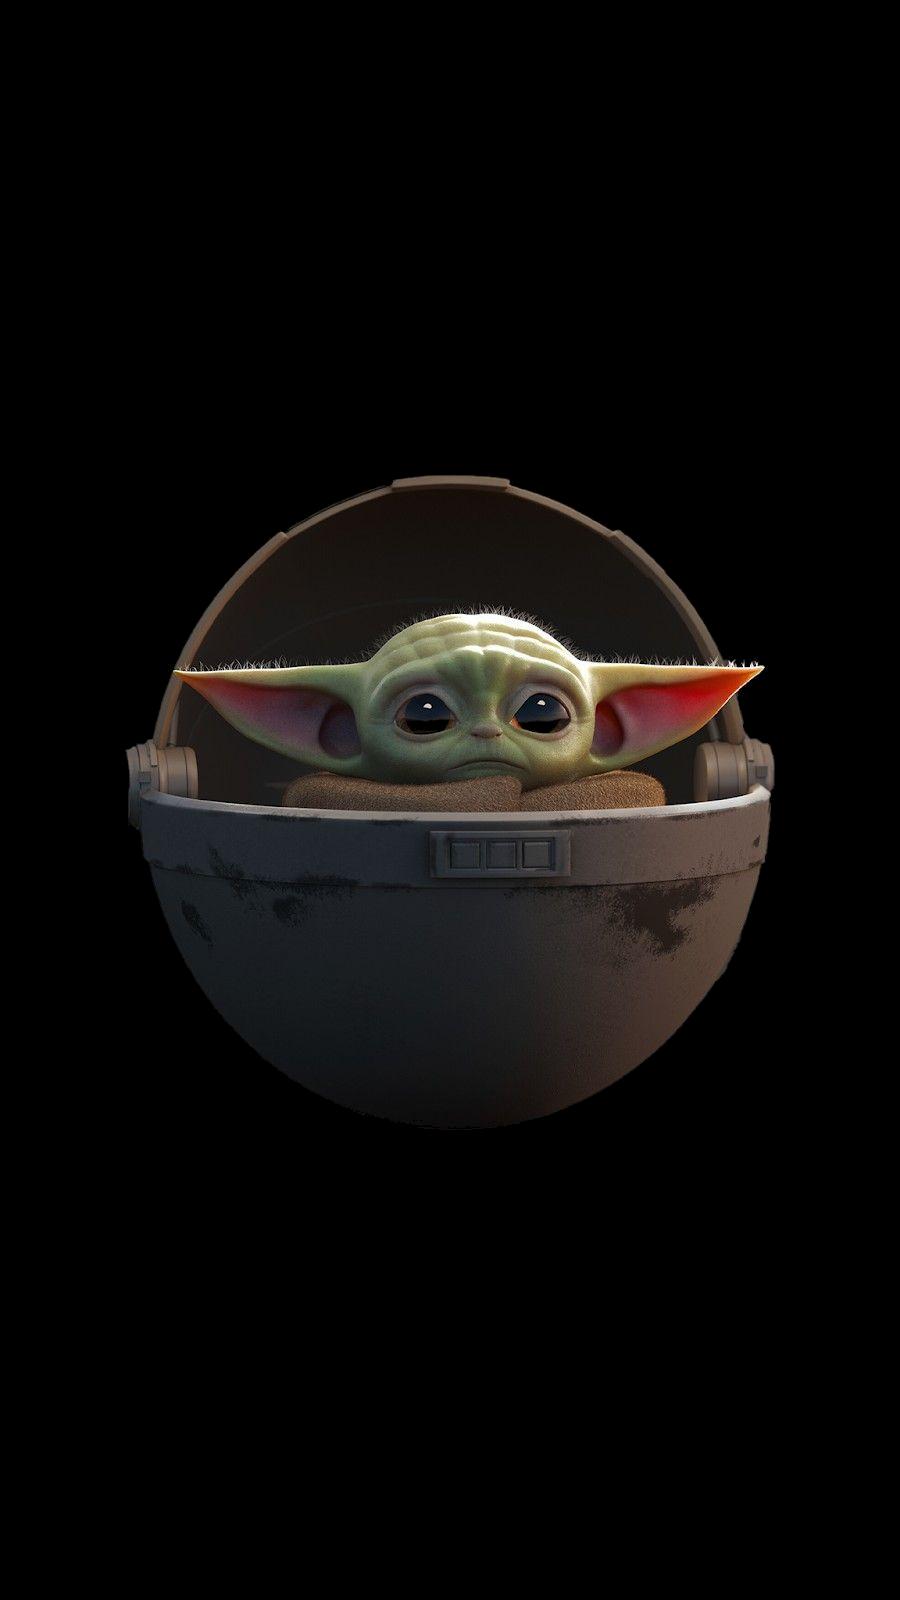 Baby Yoda Mobile Wallpaper Yoda wallpaper